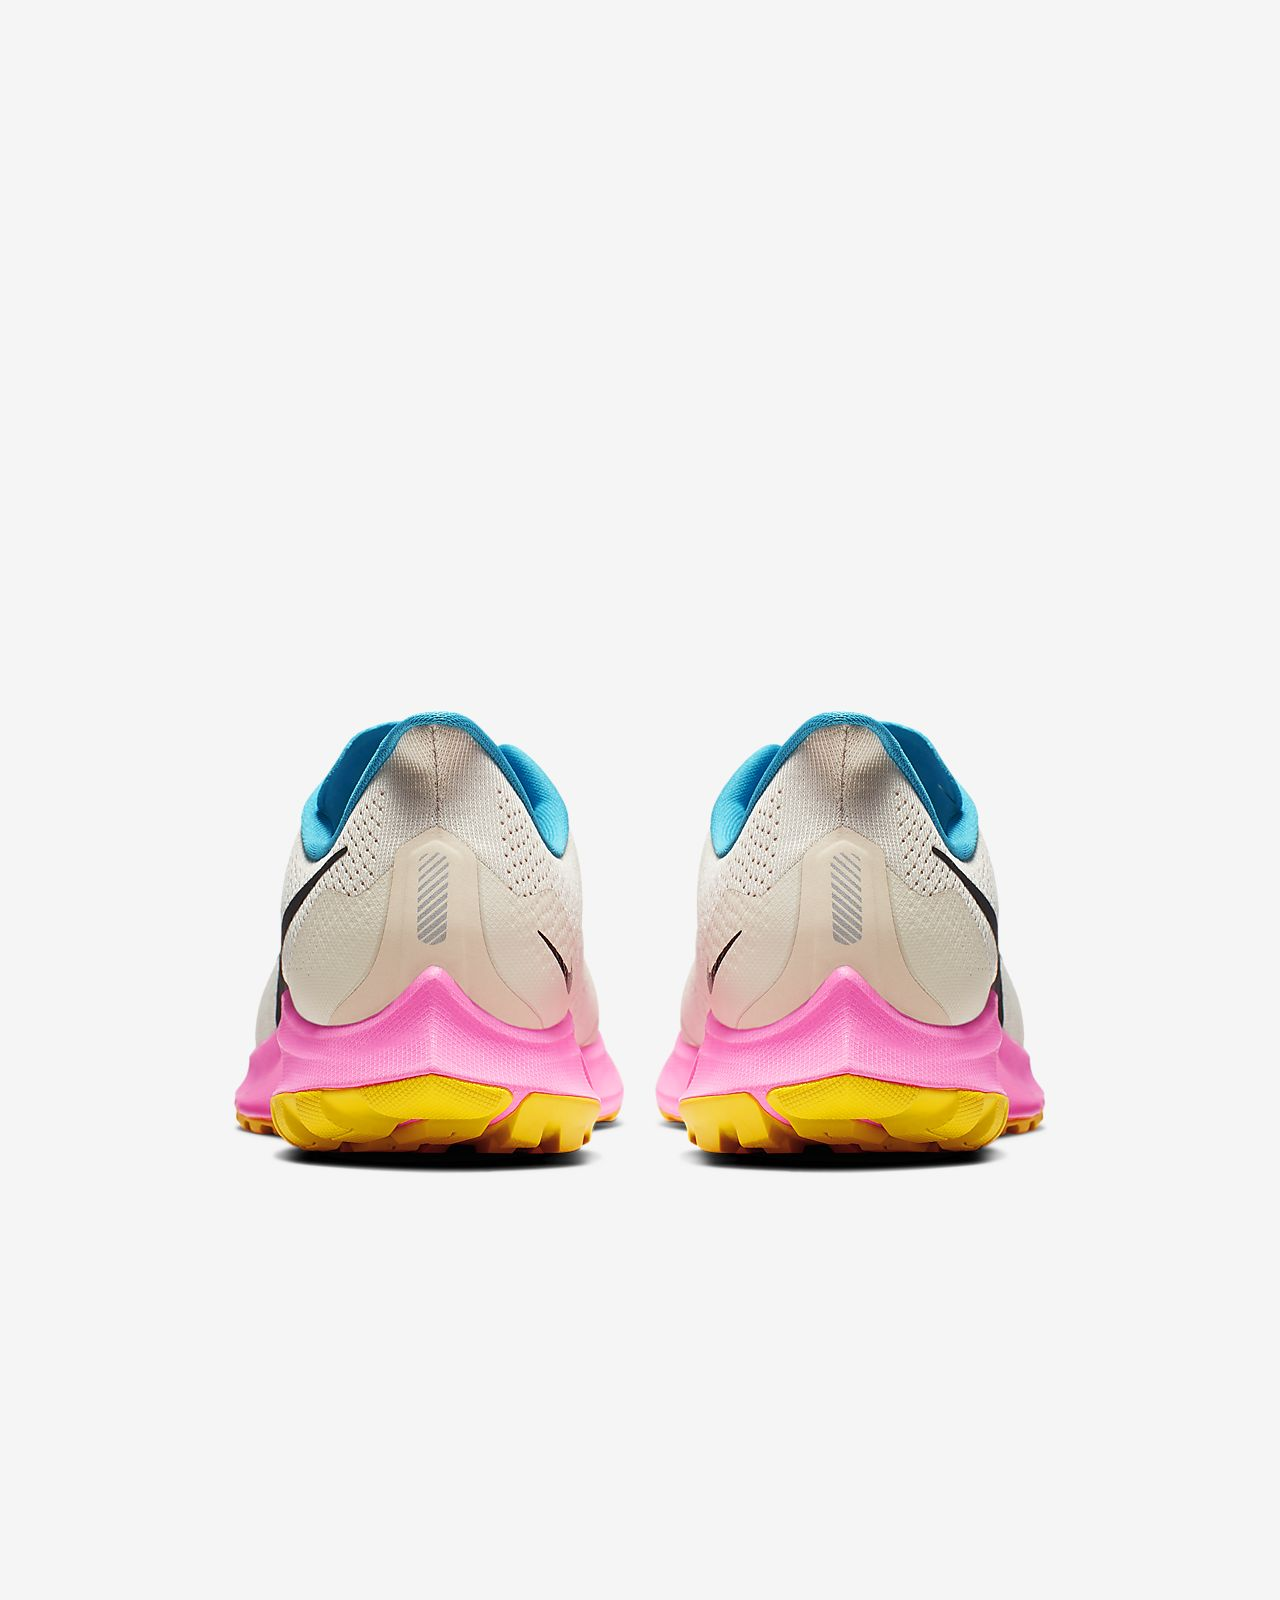 detailed look 6dd7e b1635 ... Nike Air Zoom Pegasus 36 Trail Men s Running Shoe